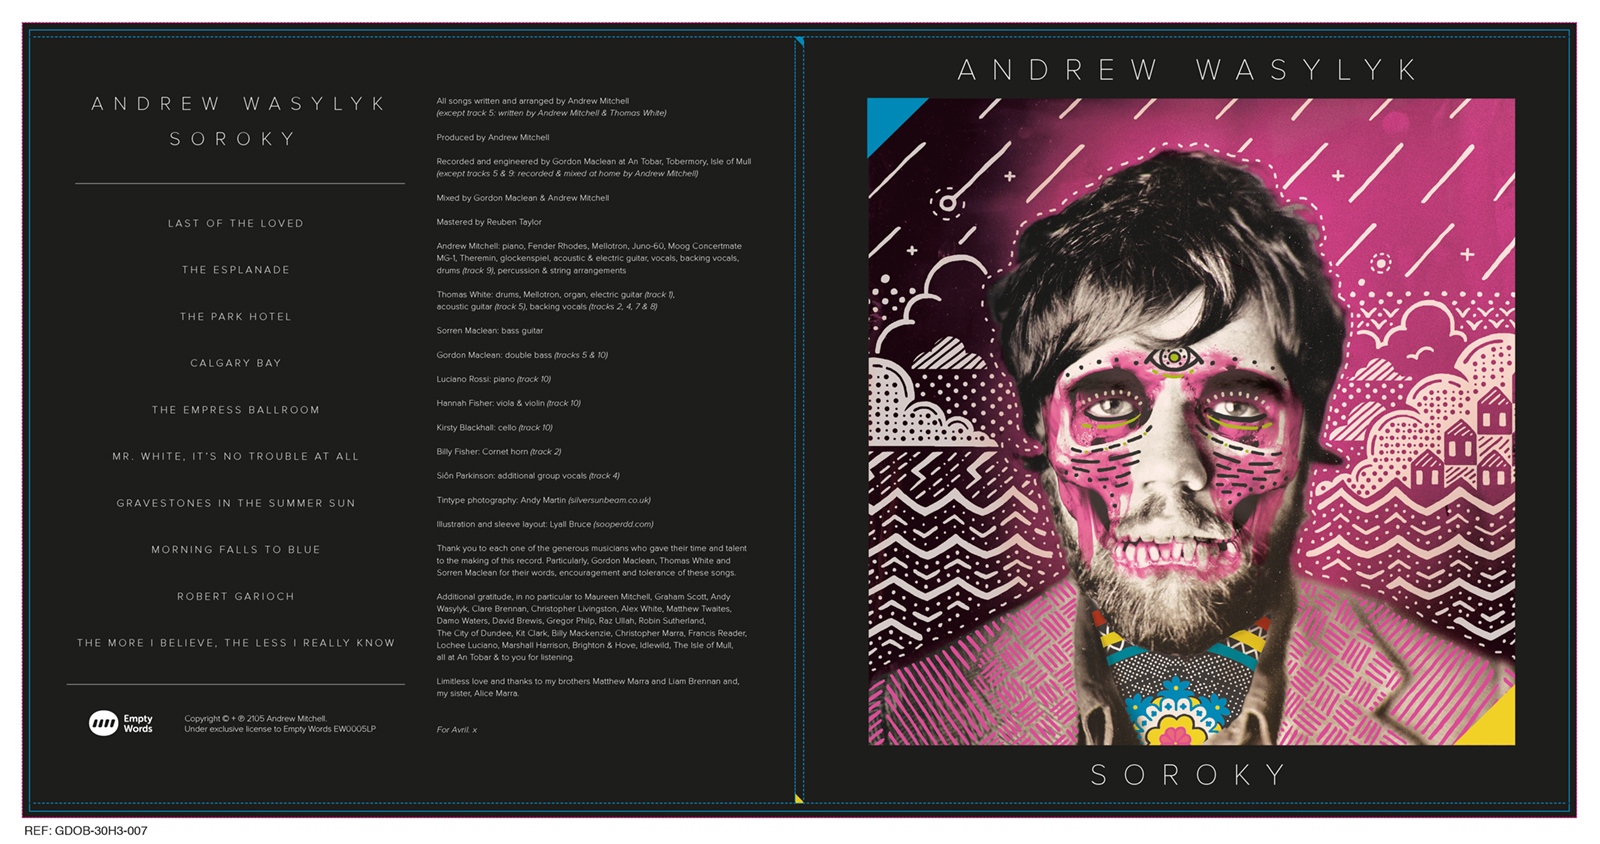 Soroky Album Cover Spread